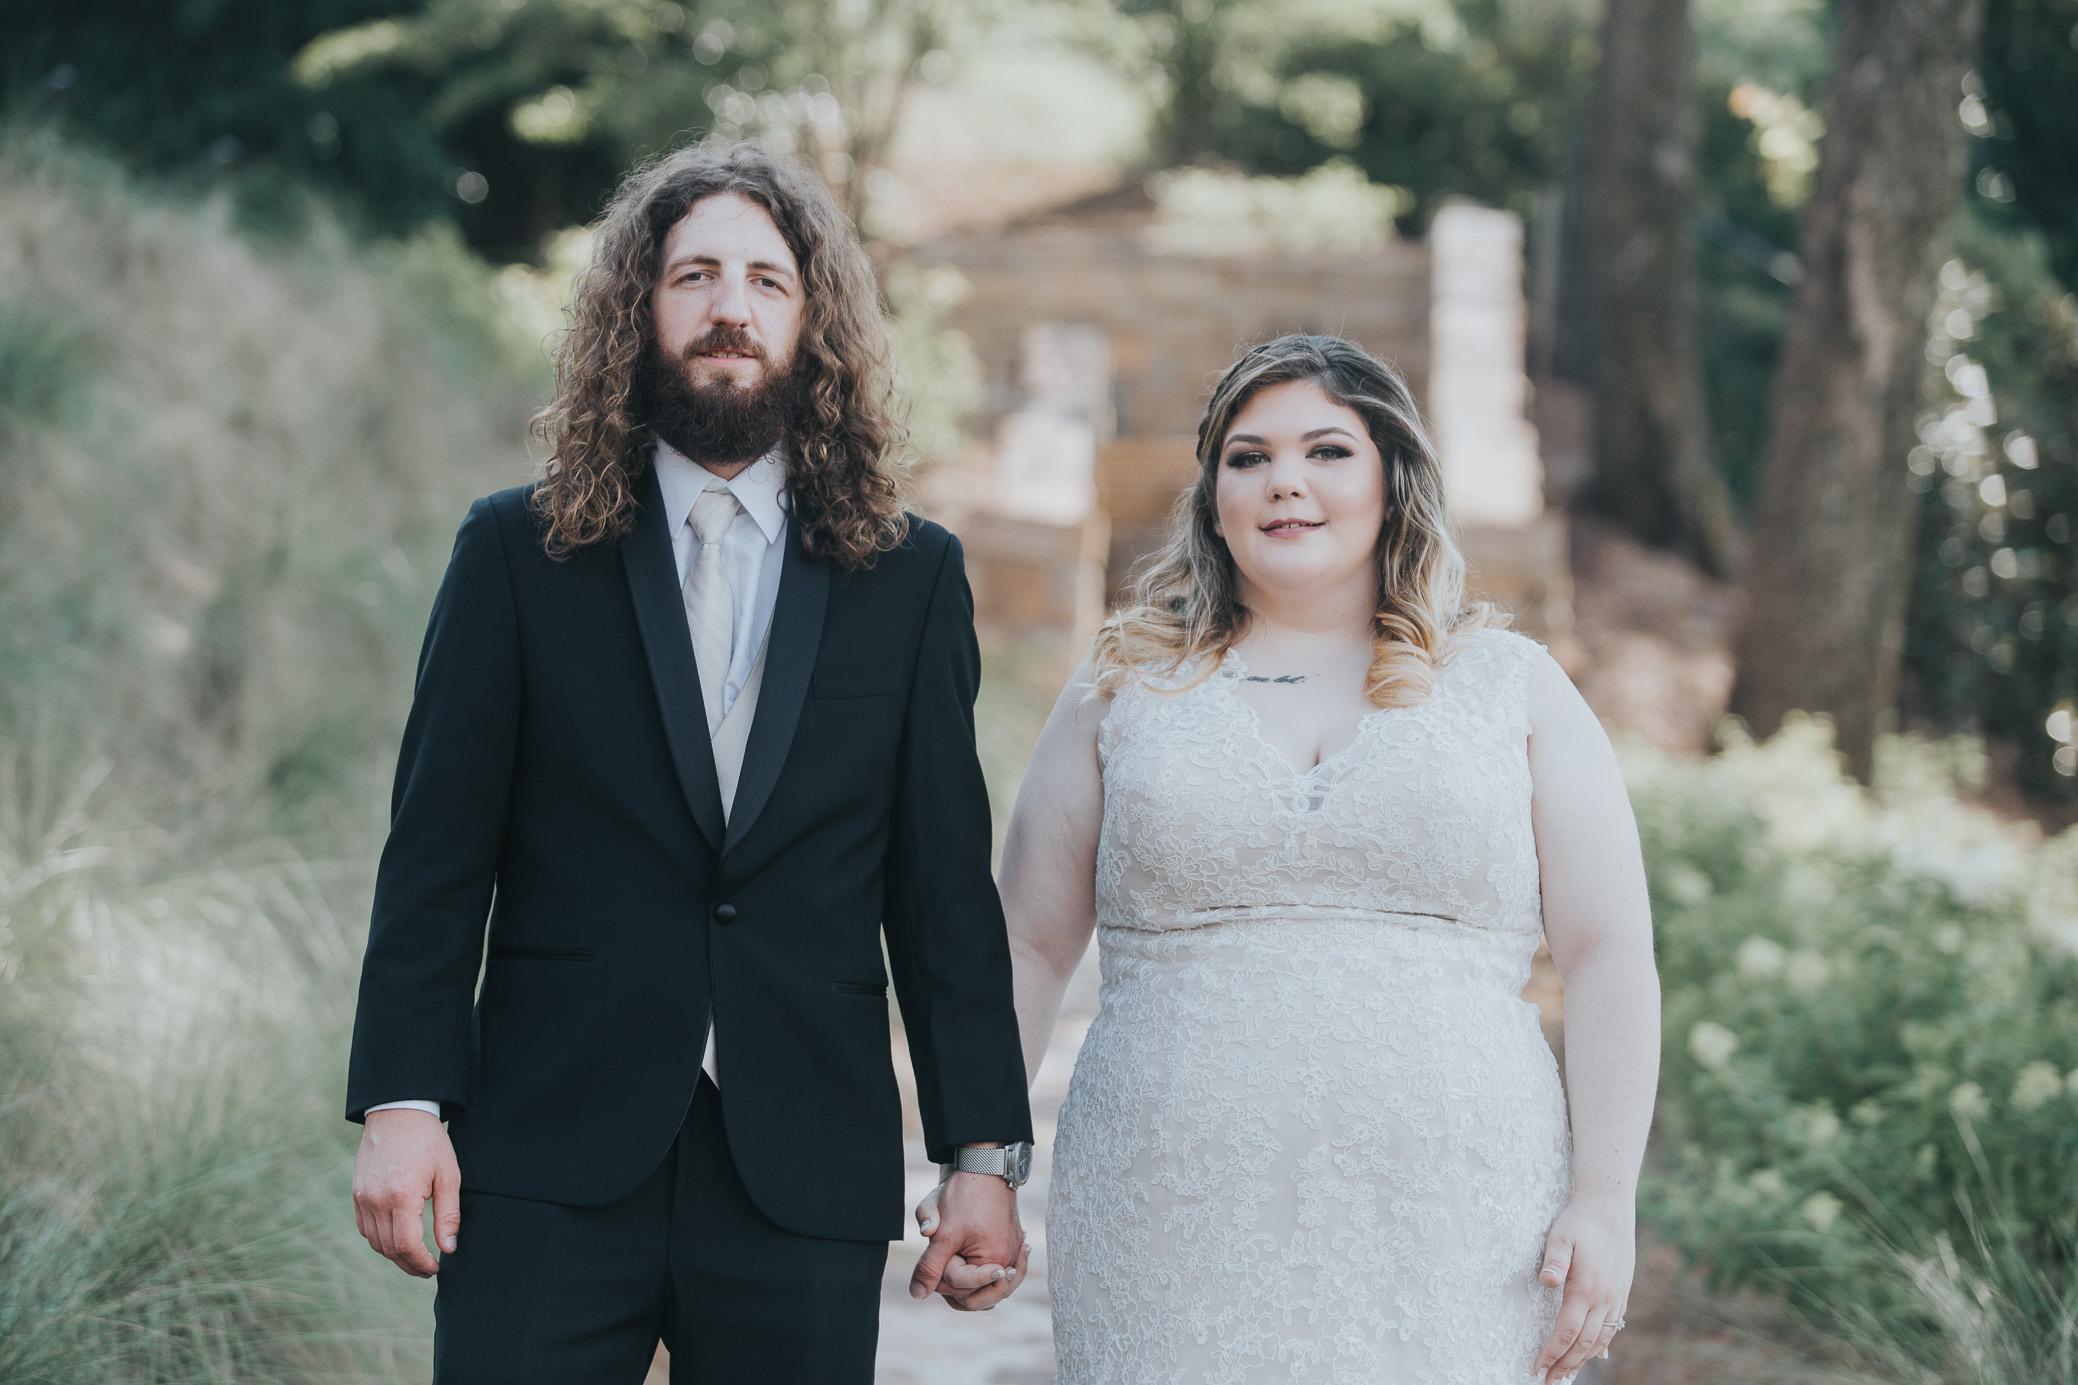 Vulcan Park Birmingham Wedding Photography